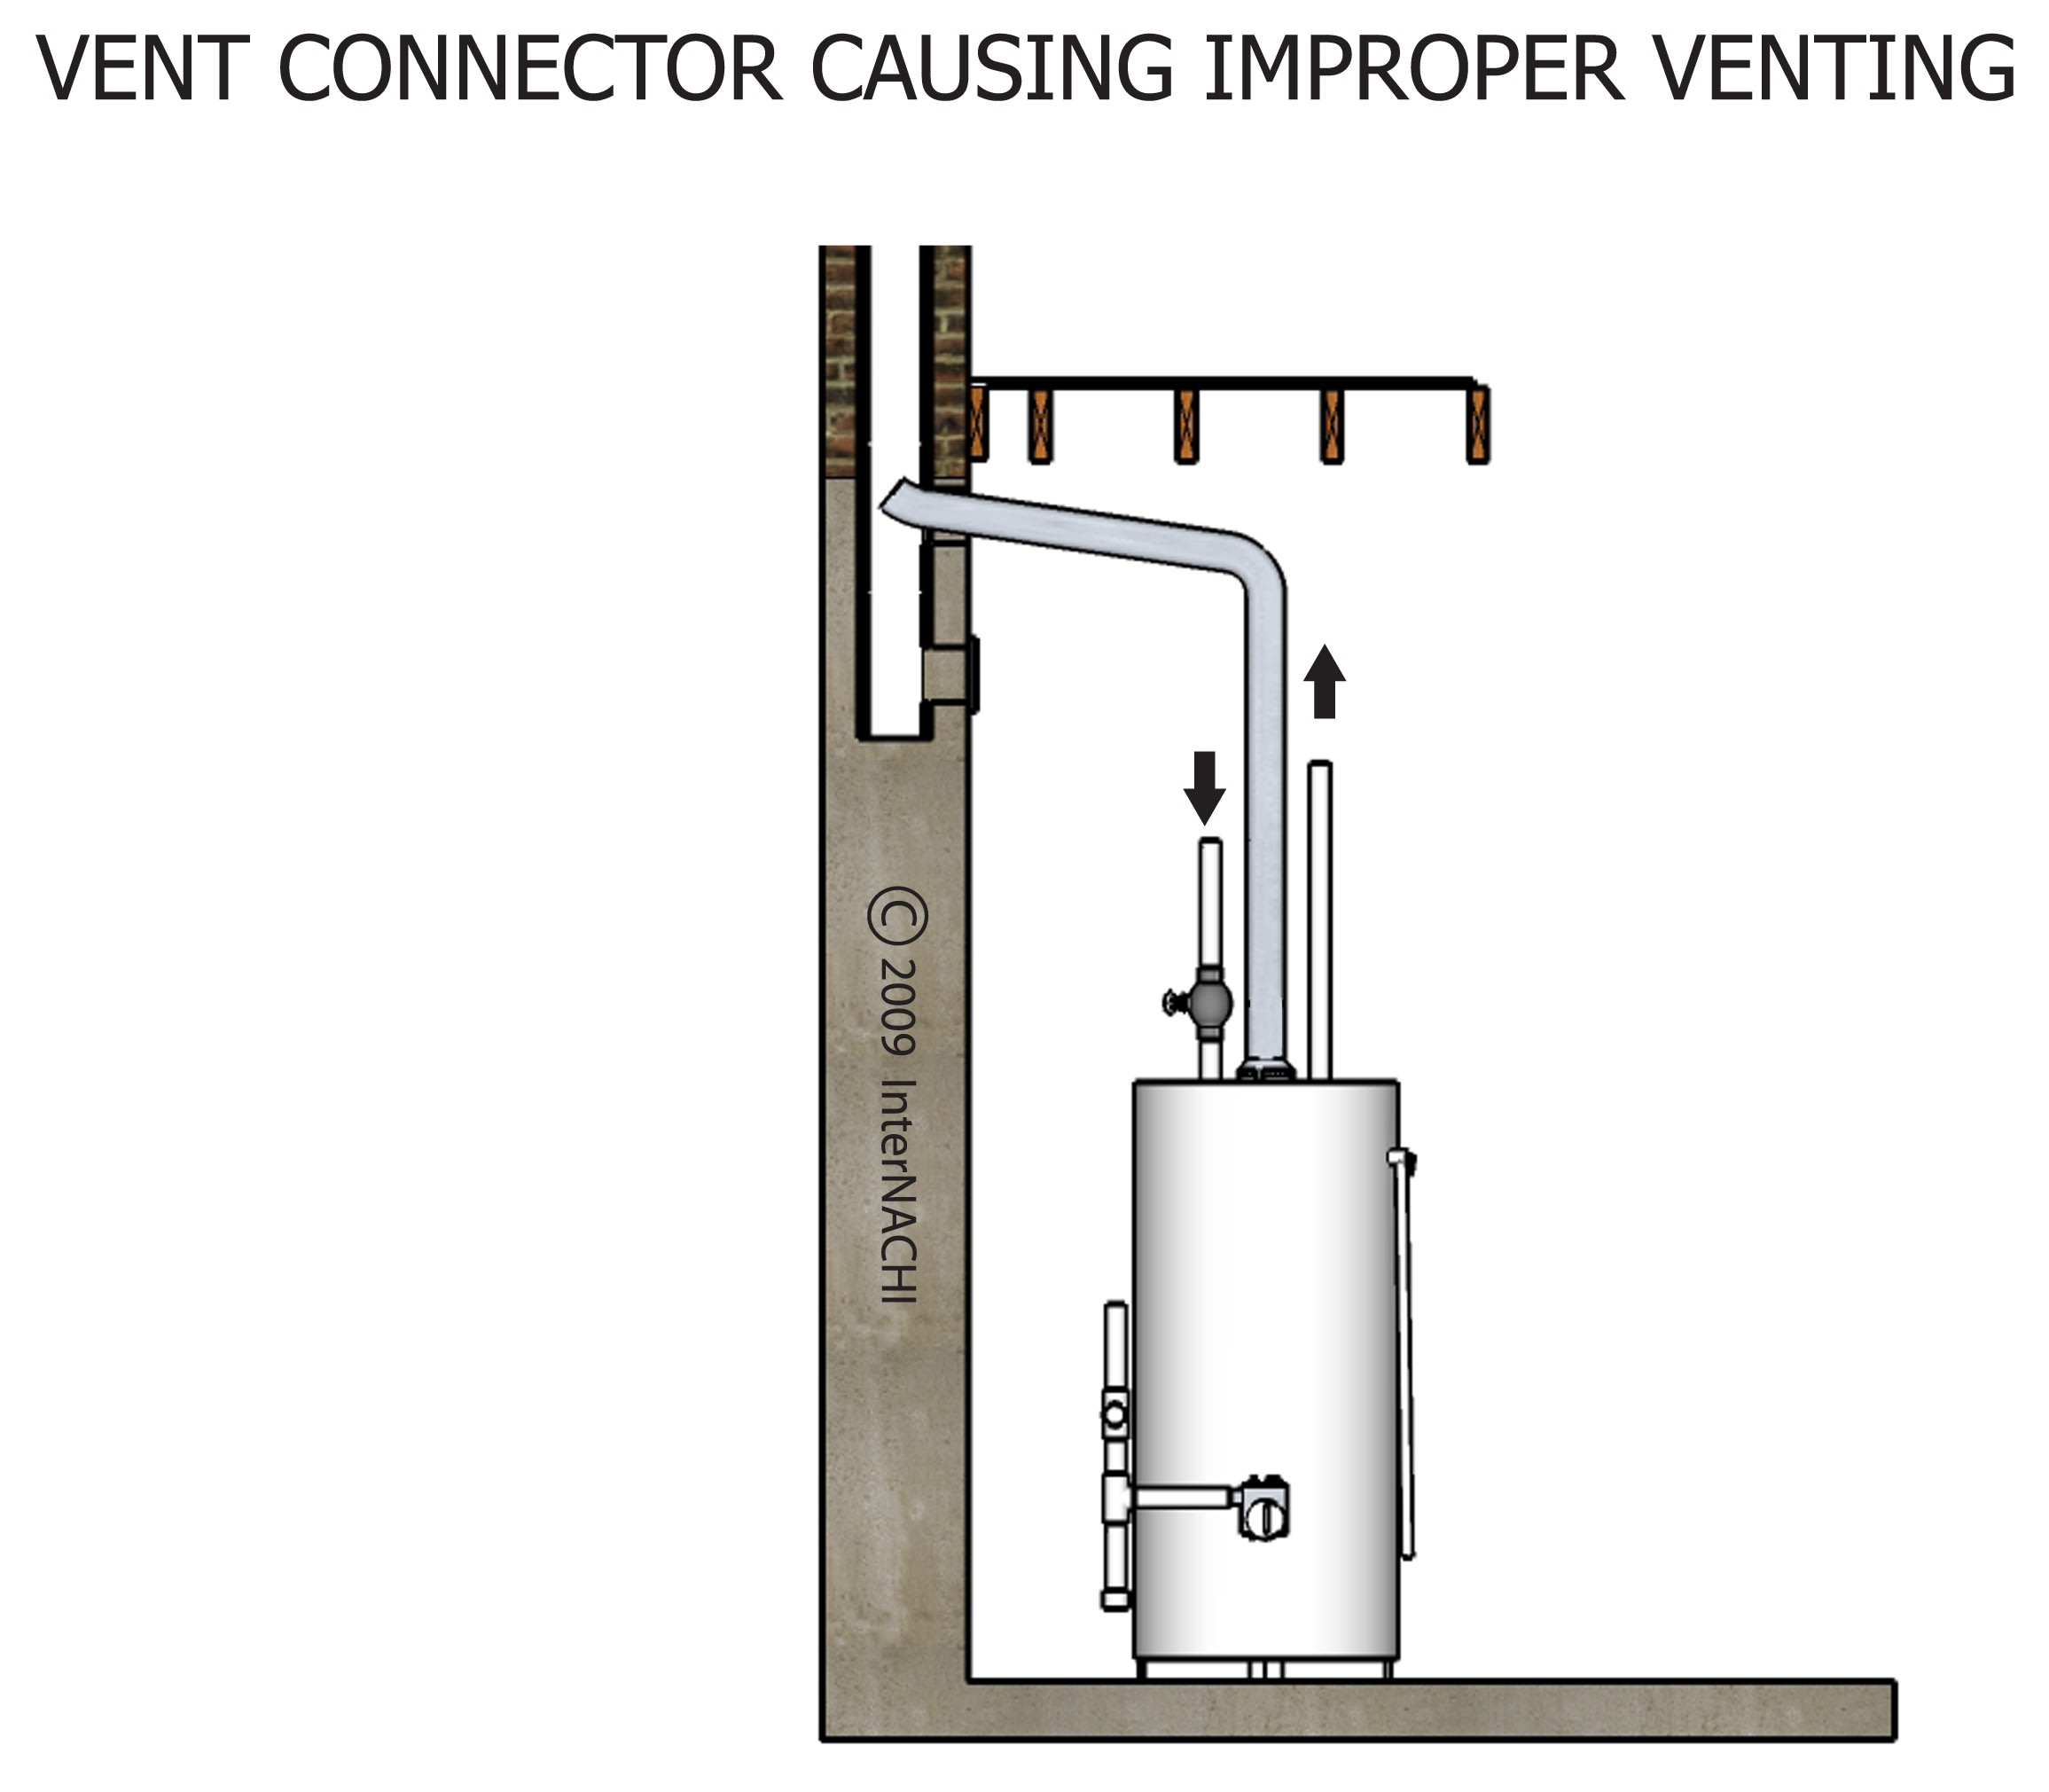 Improper vent connector.